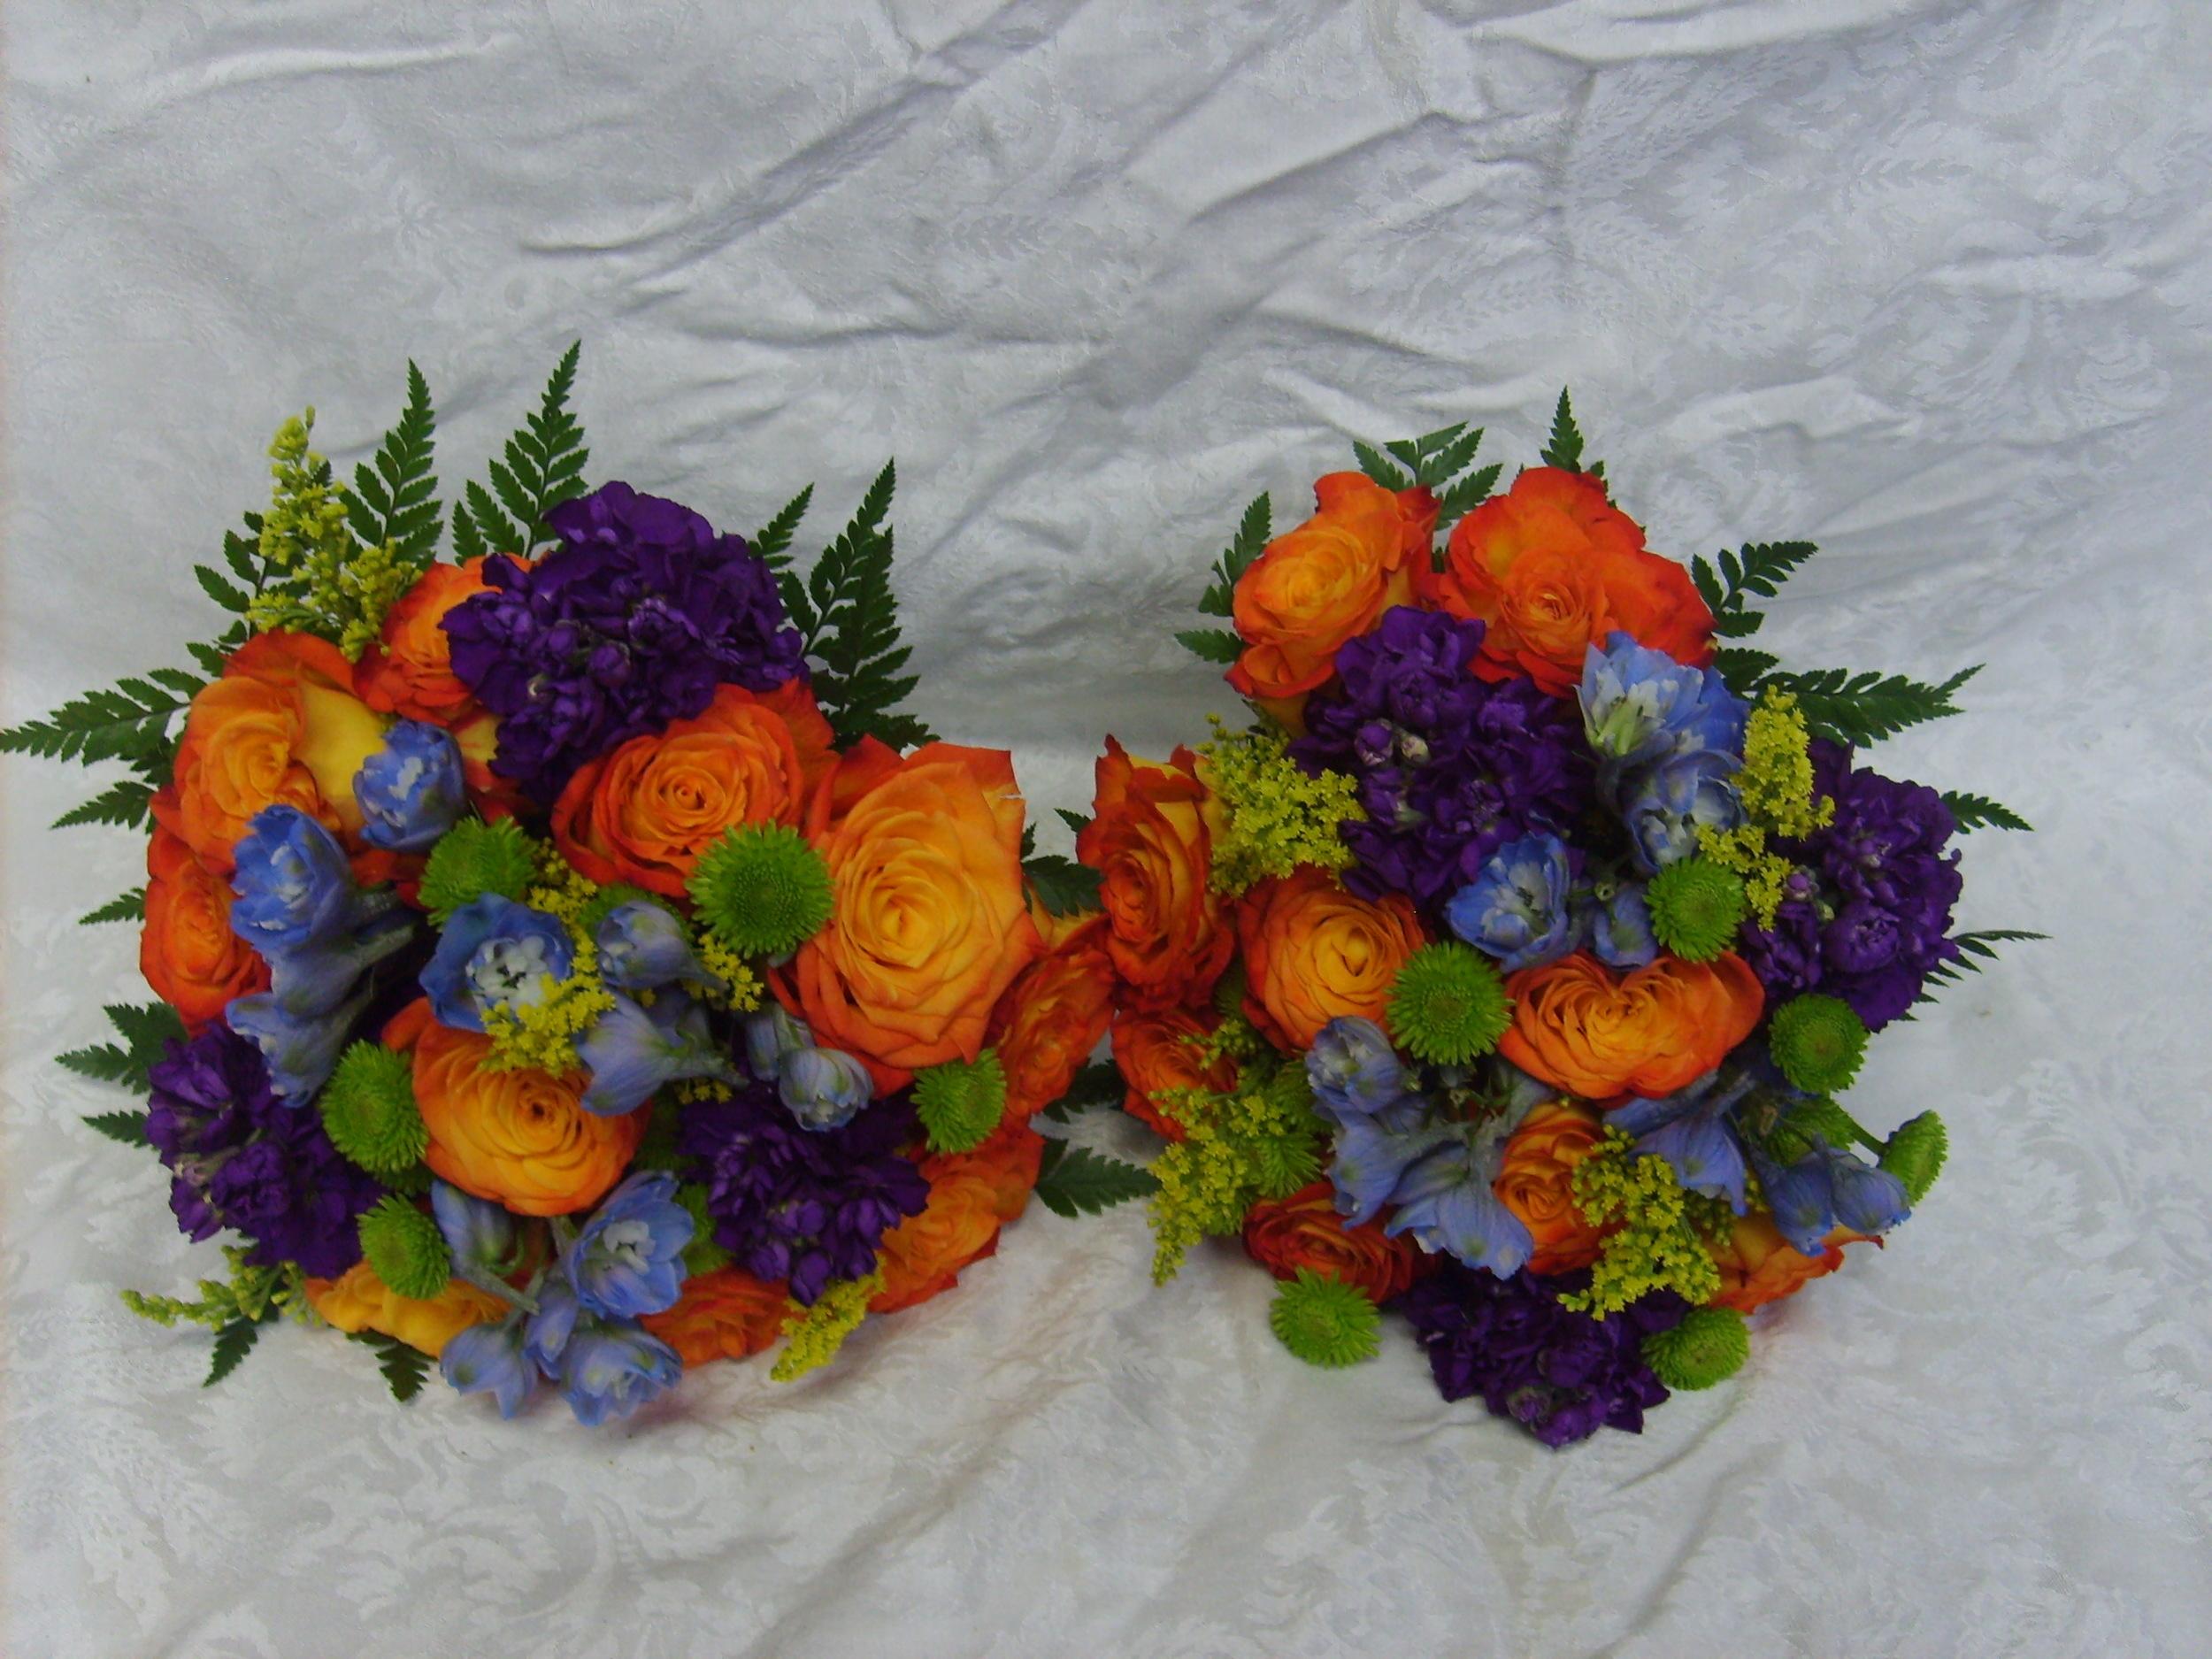 GRAD PICS AND FLOWERS 046.jpg